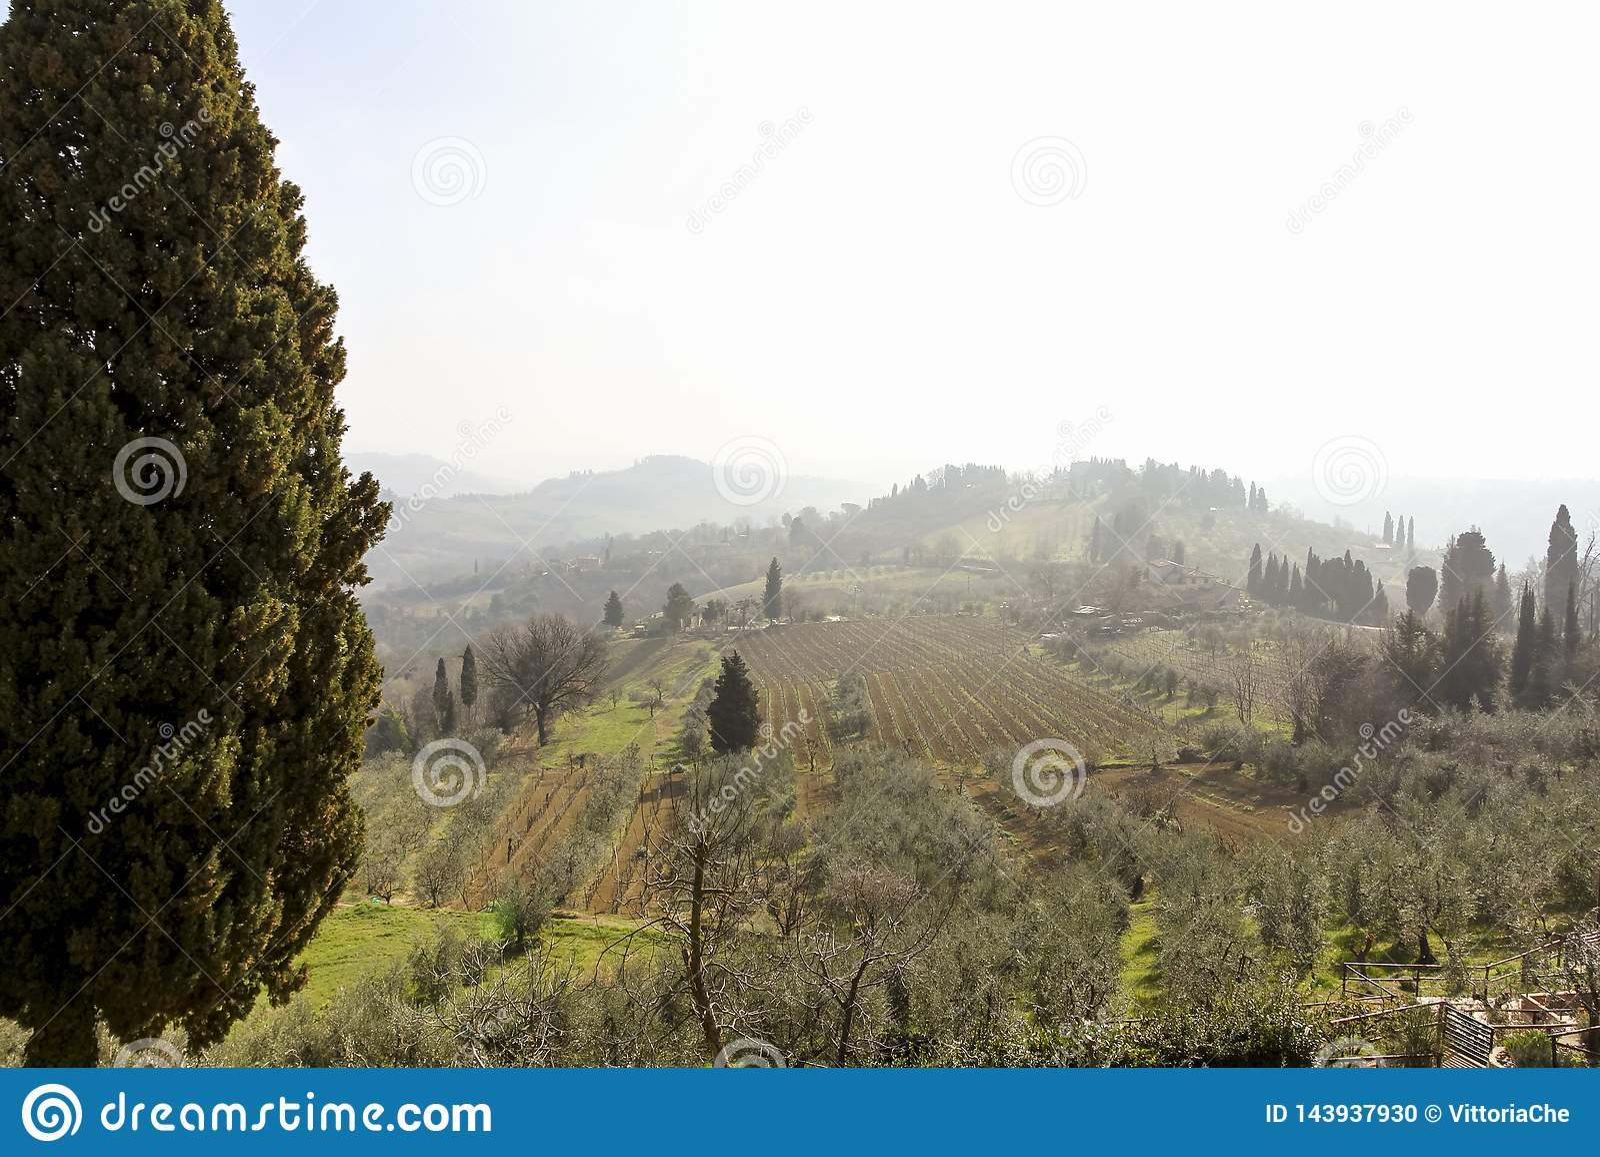 Früher nebeliger Morgen Schöne Frühlingslandschaft in Toskana, Italien, Europa